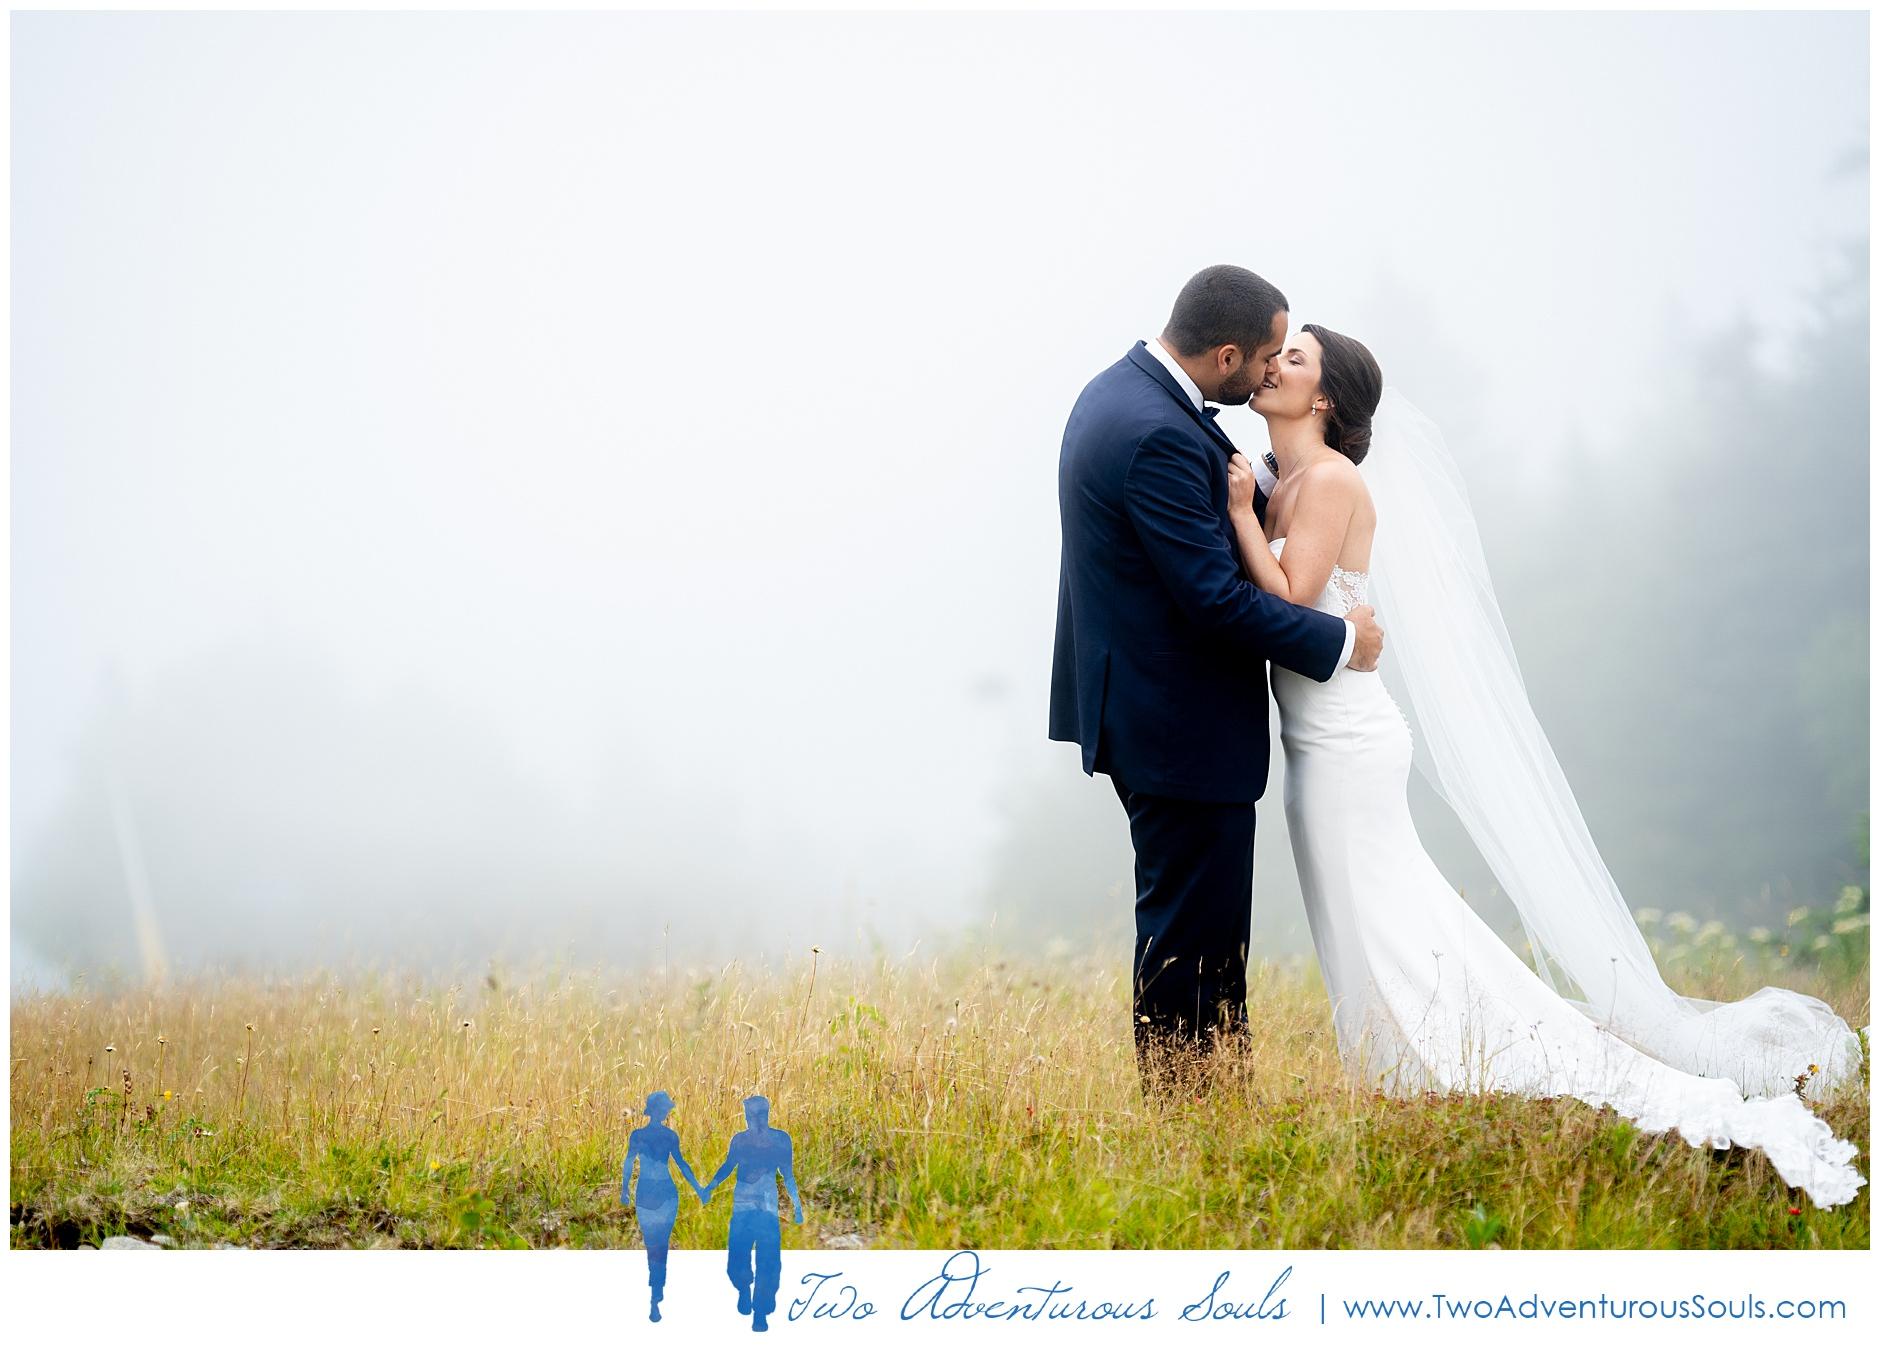 Sugarloaf Outdoor Center Wedding Photographers, Destination Wedding Photographers, Two Adventurous Souls-081719_0023.jpg